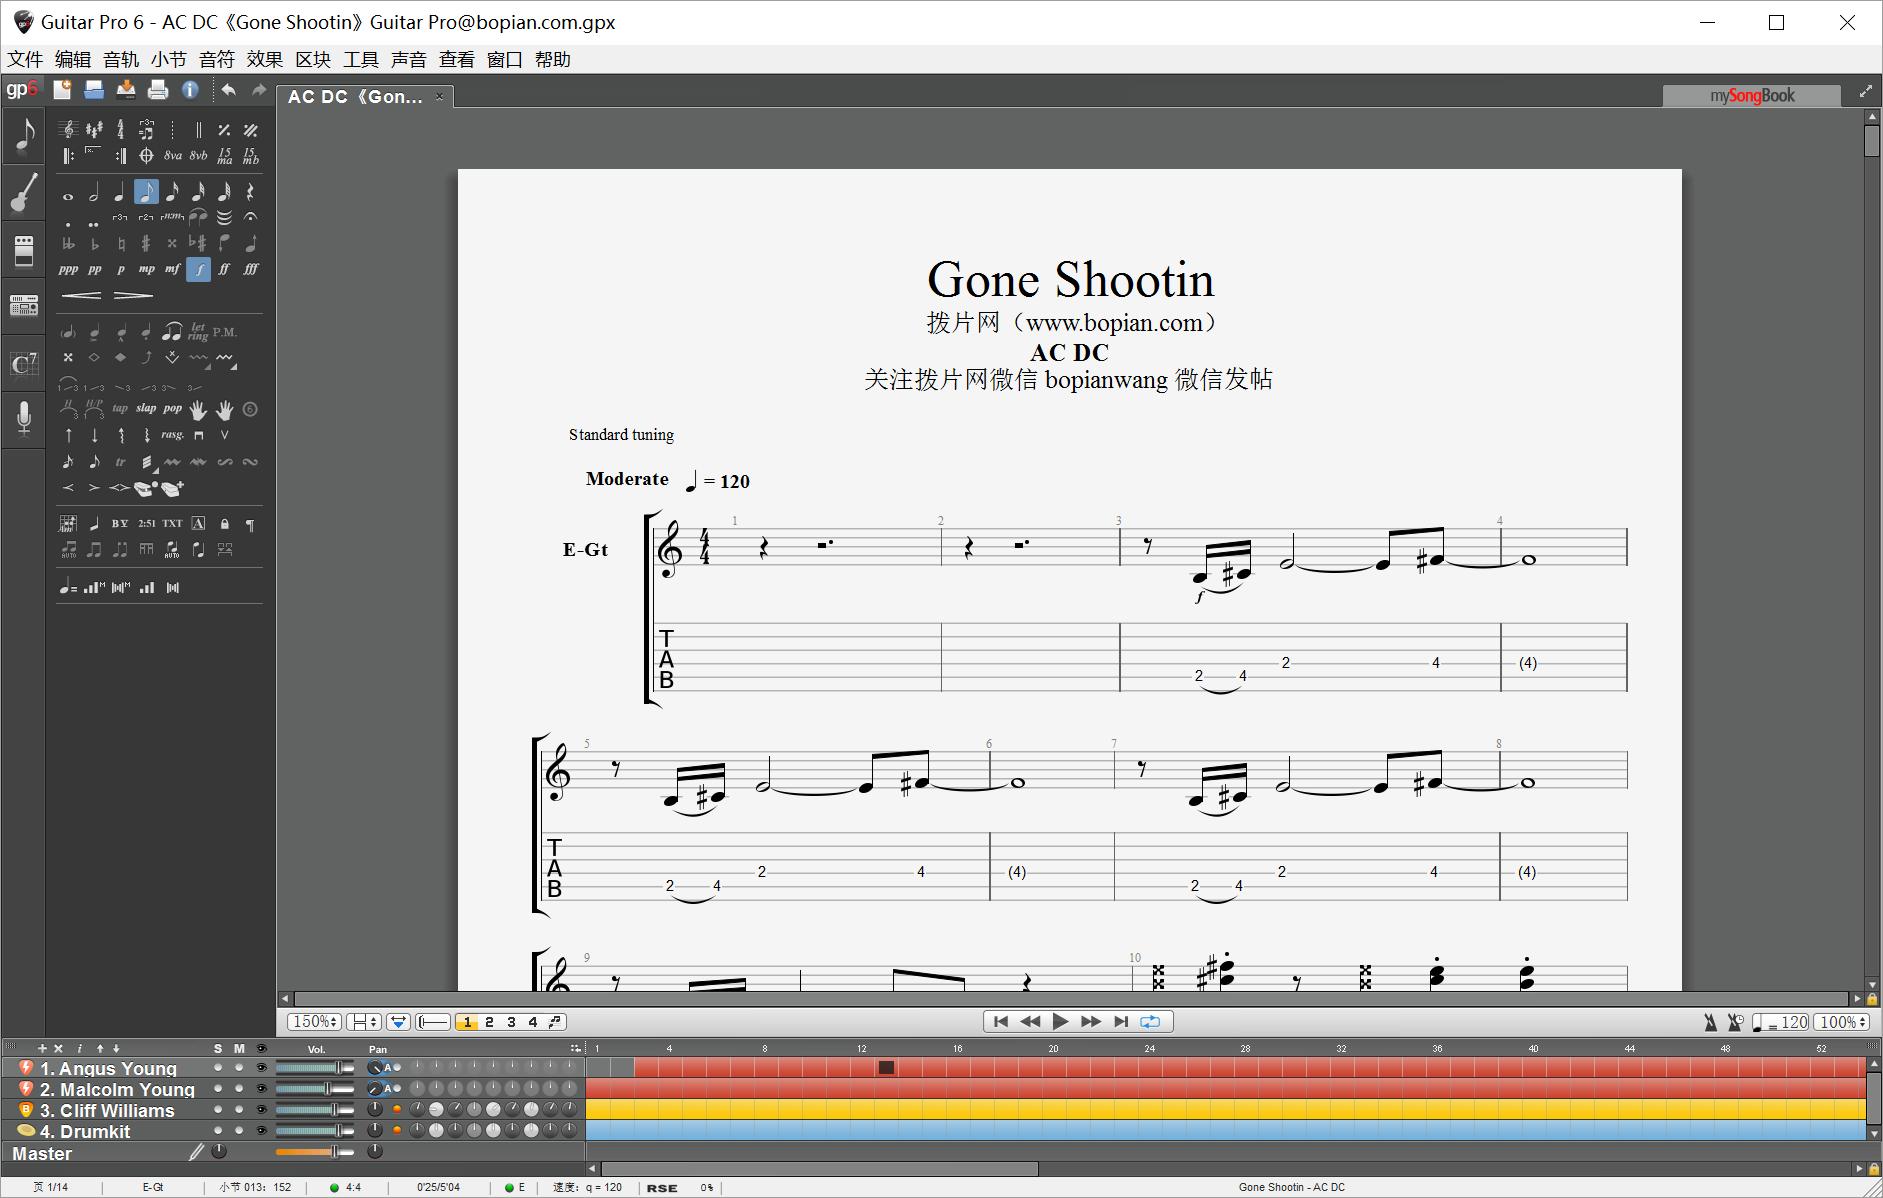 拨片网_乐队谱_AC_DC《Gone_Shootin》Guitar_Pro@bopian.com_.png